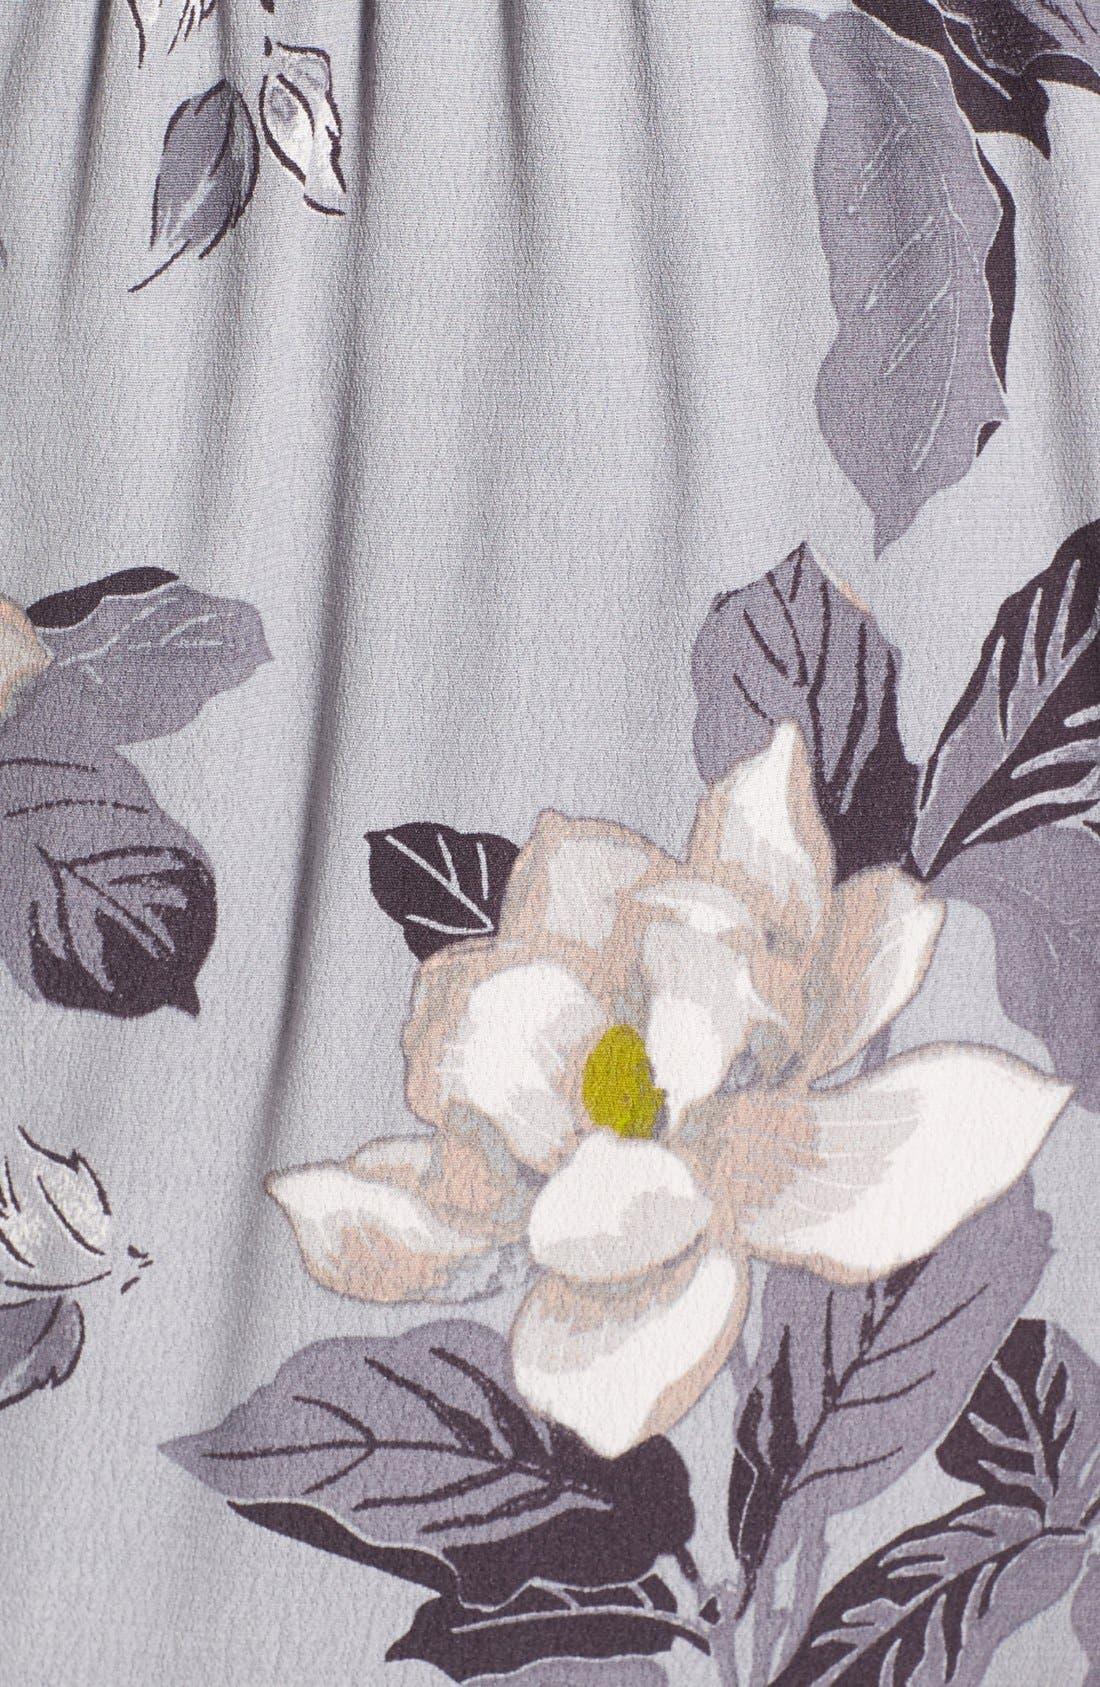 ASTR Ruffle Surplice High/Low Maxi Dress,                             Alternate thumbnail 5, color,                             Grey Multi Floral